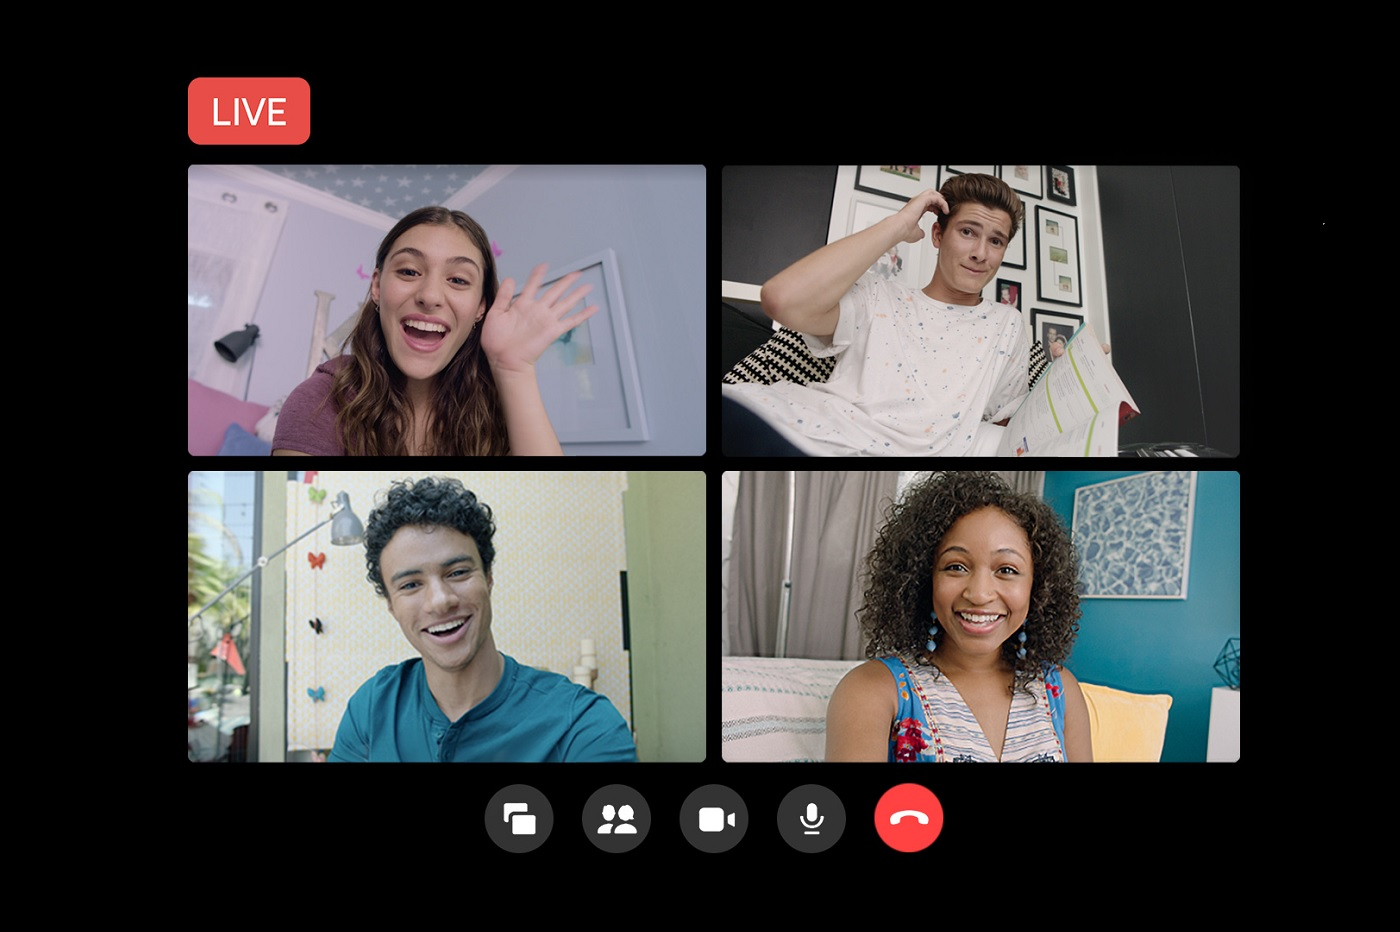 Intégration entre Rooms et Facebook Live